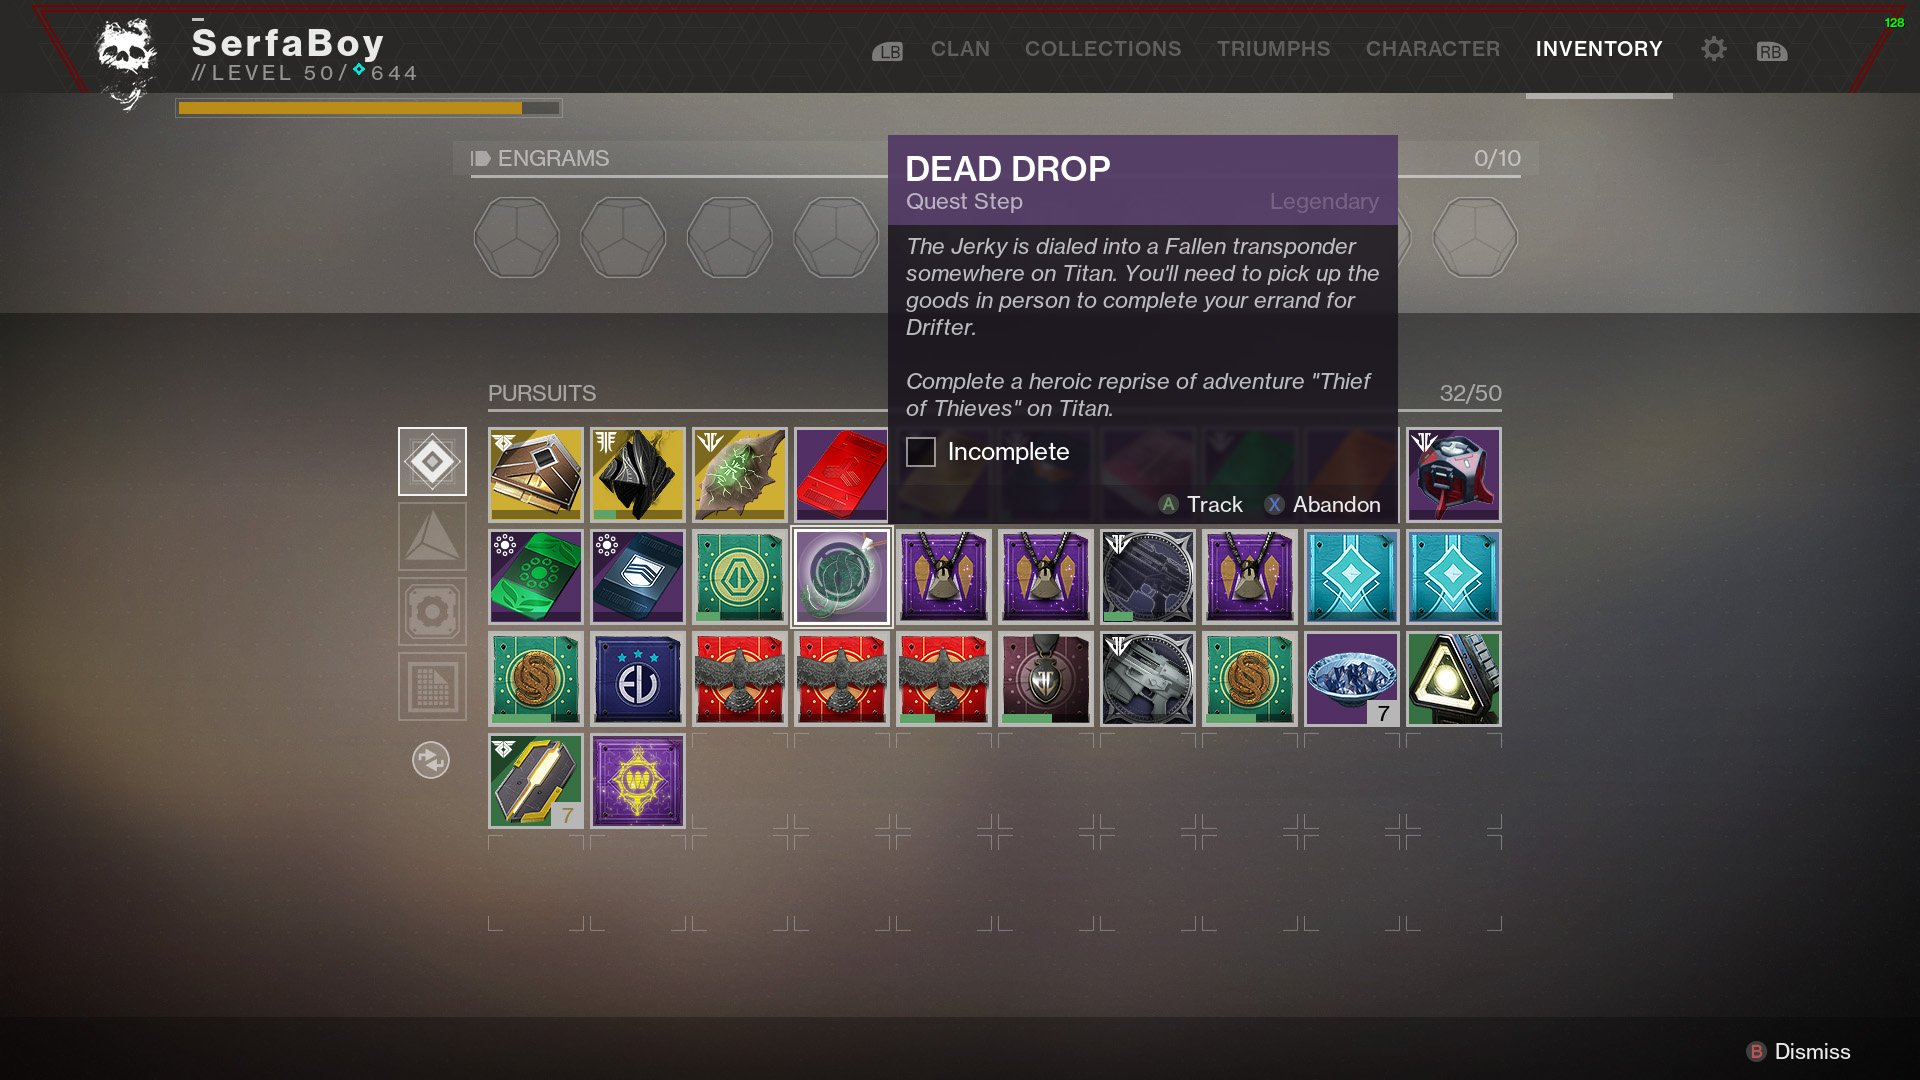 Decision Point, Allegiance quest line - Destiny 2 | Shacknews